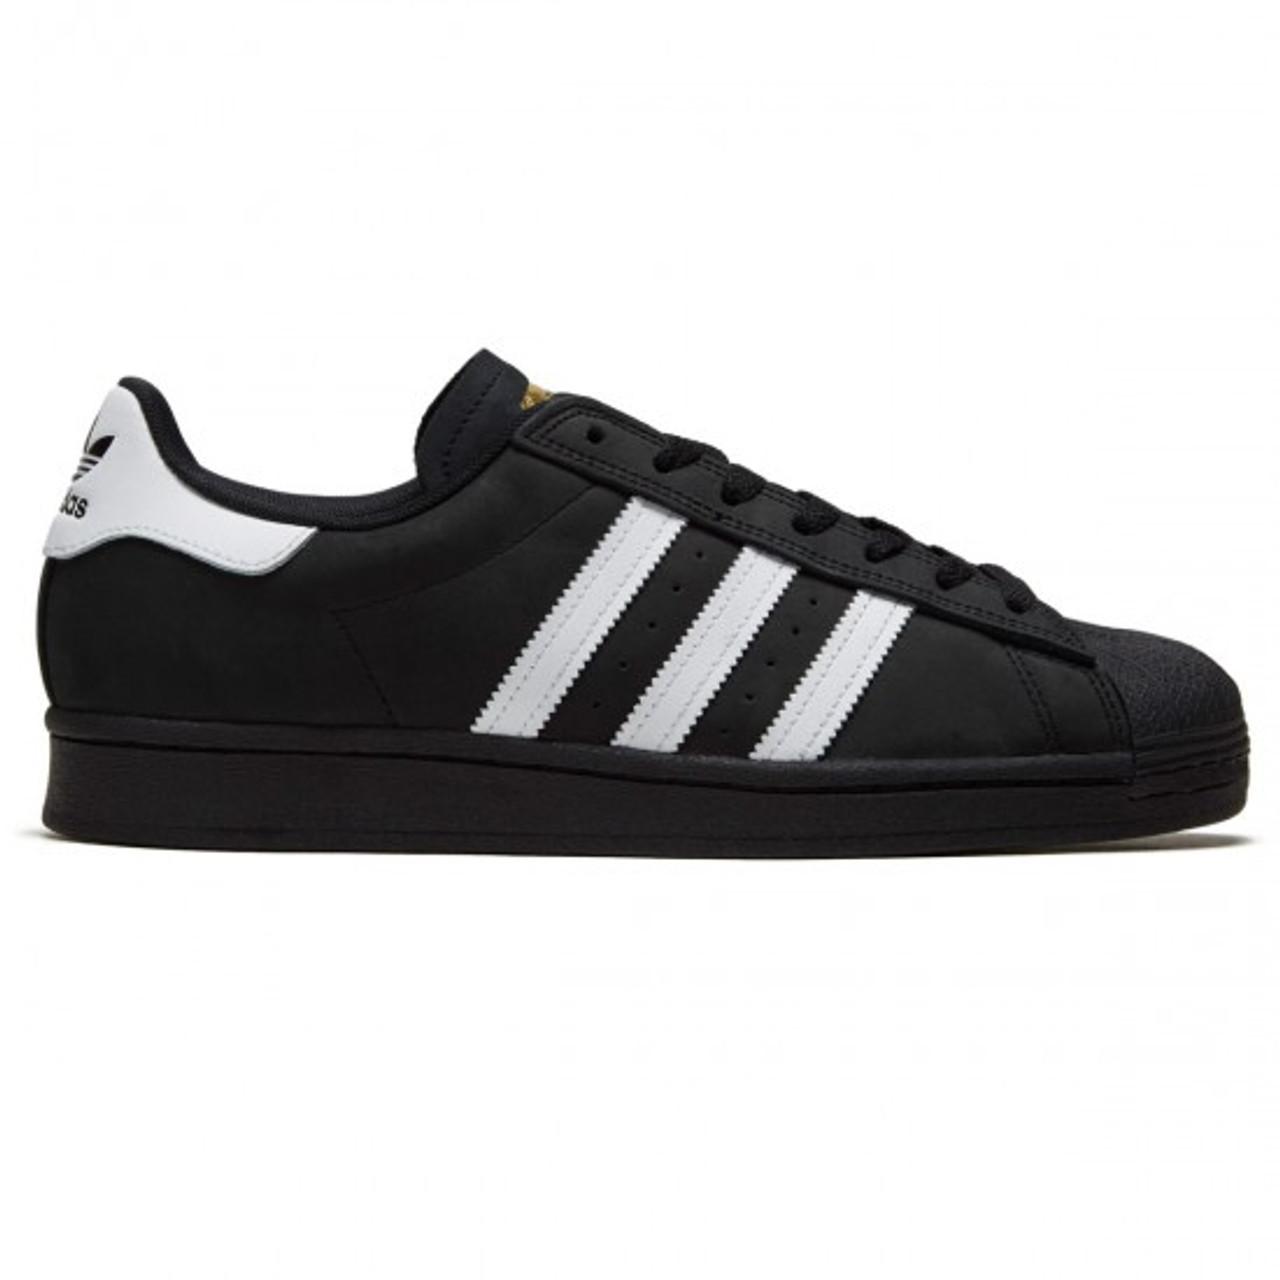 Adidas Superstar Shell Toe Shoes Black